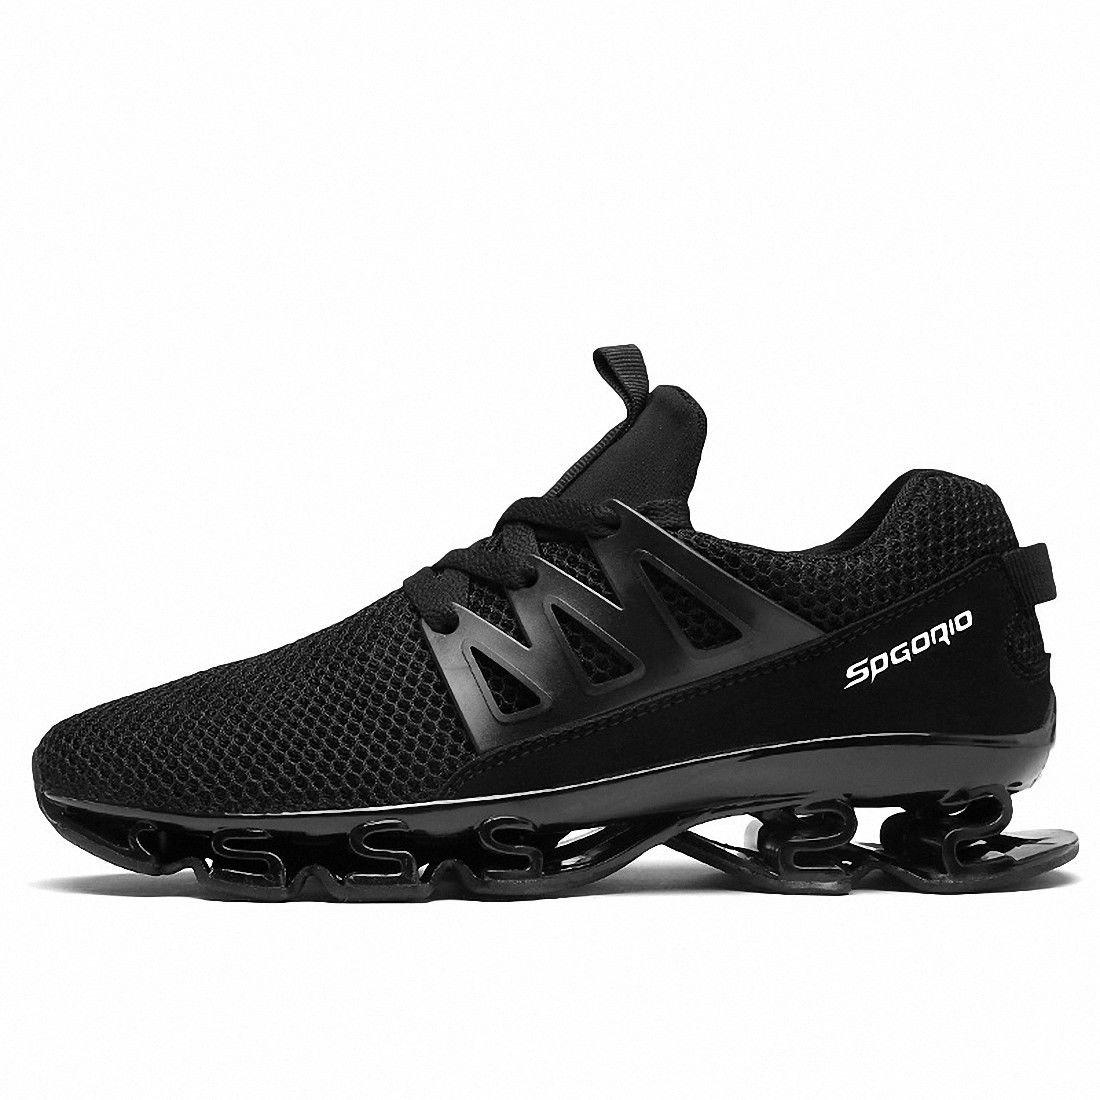 adidas ultra stivali 2.0 nero and bianca